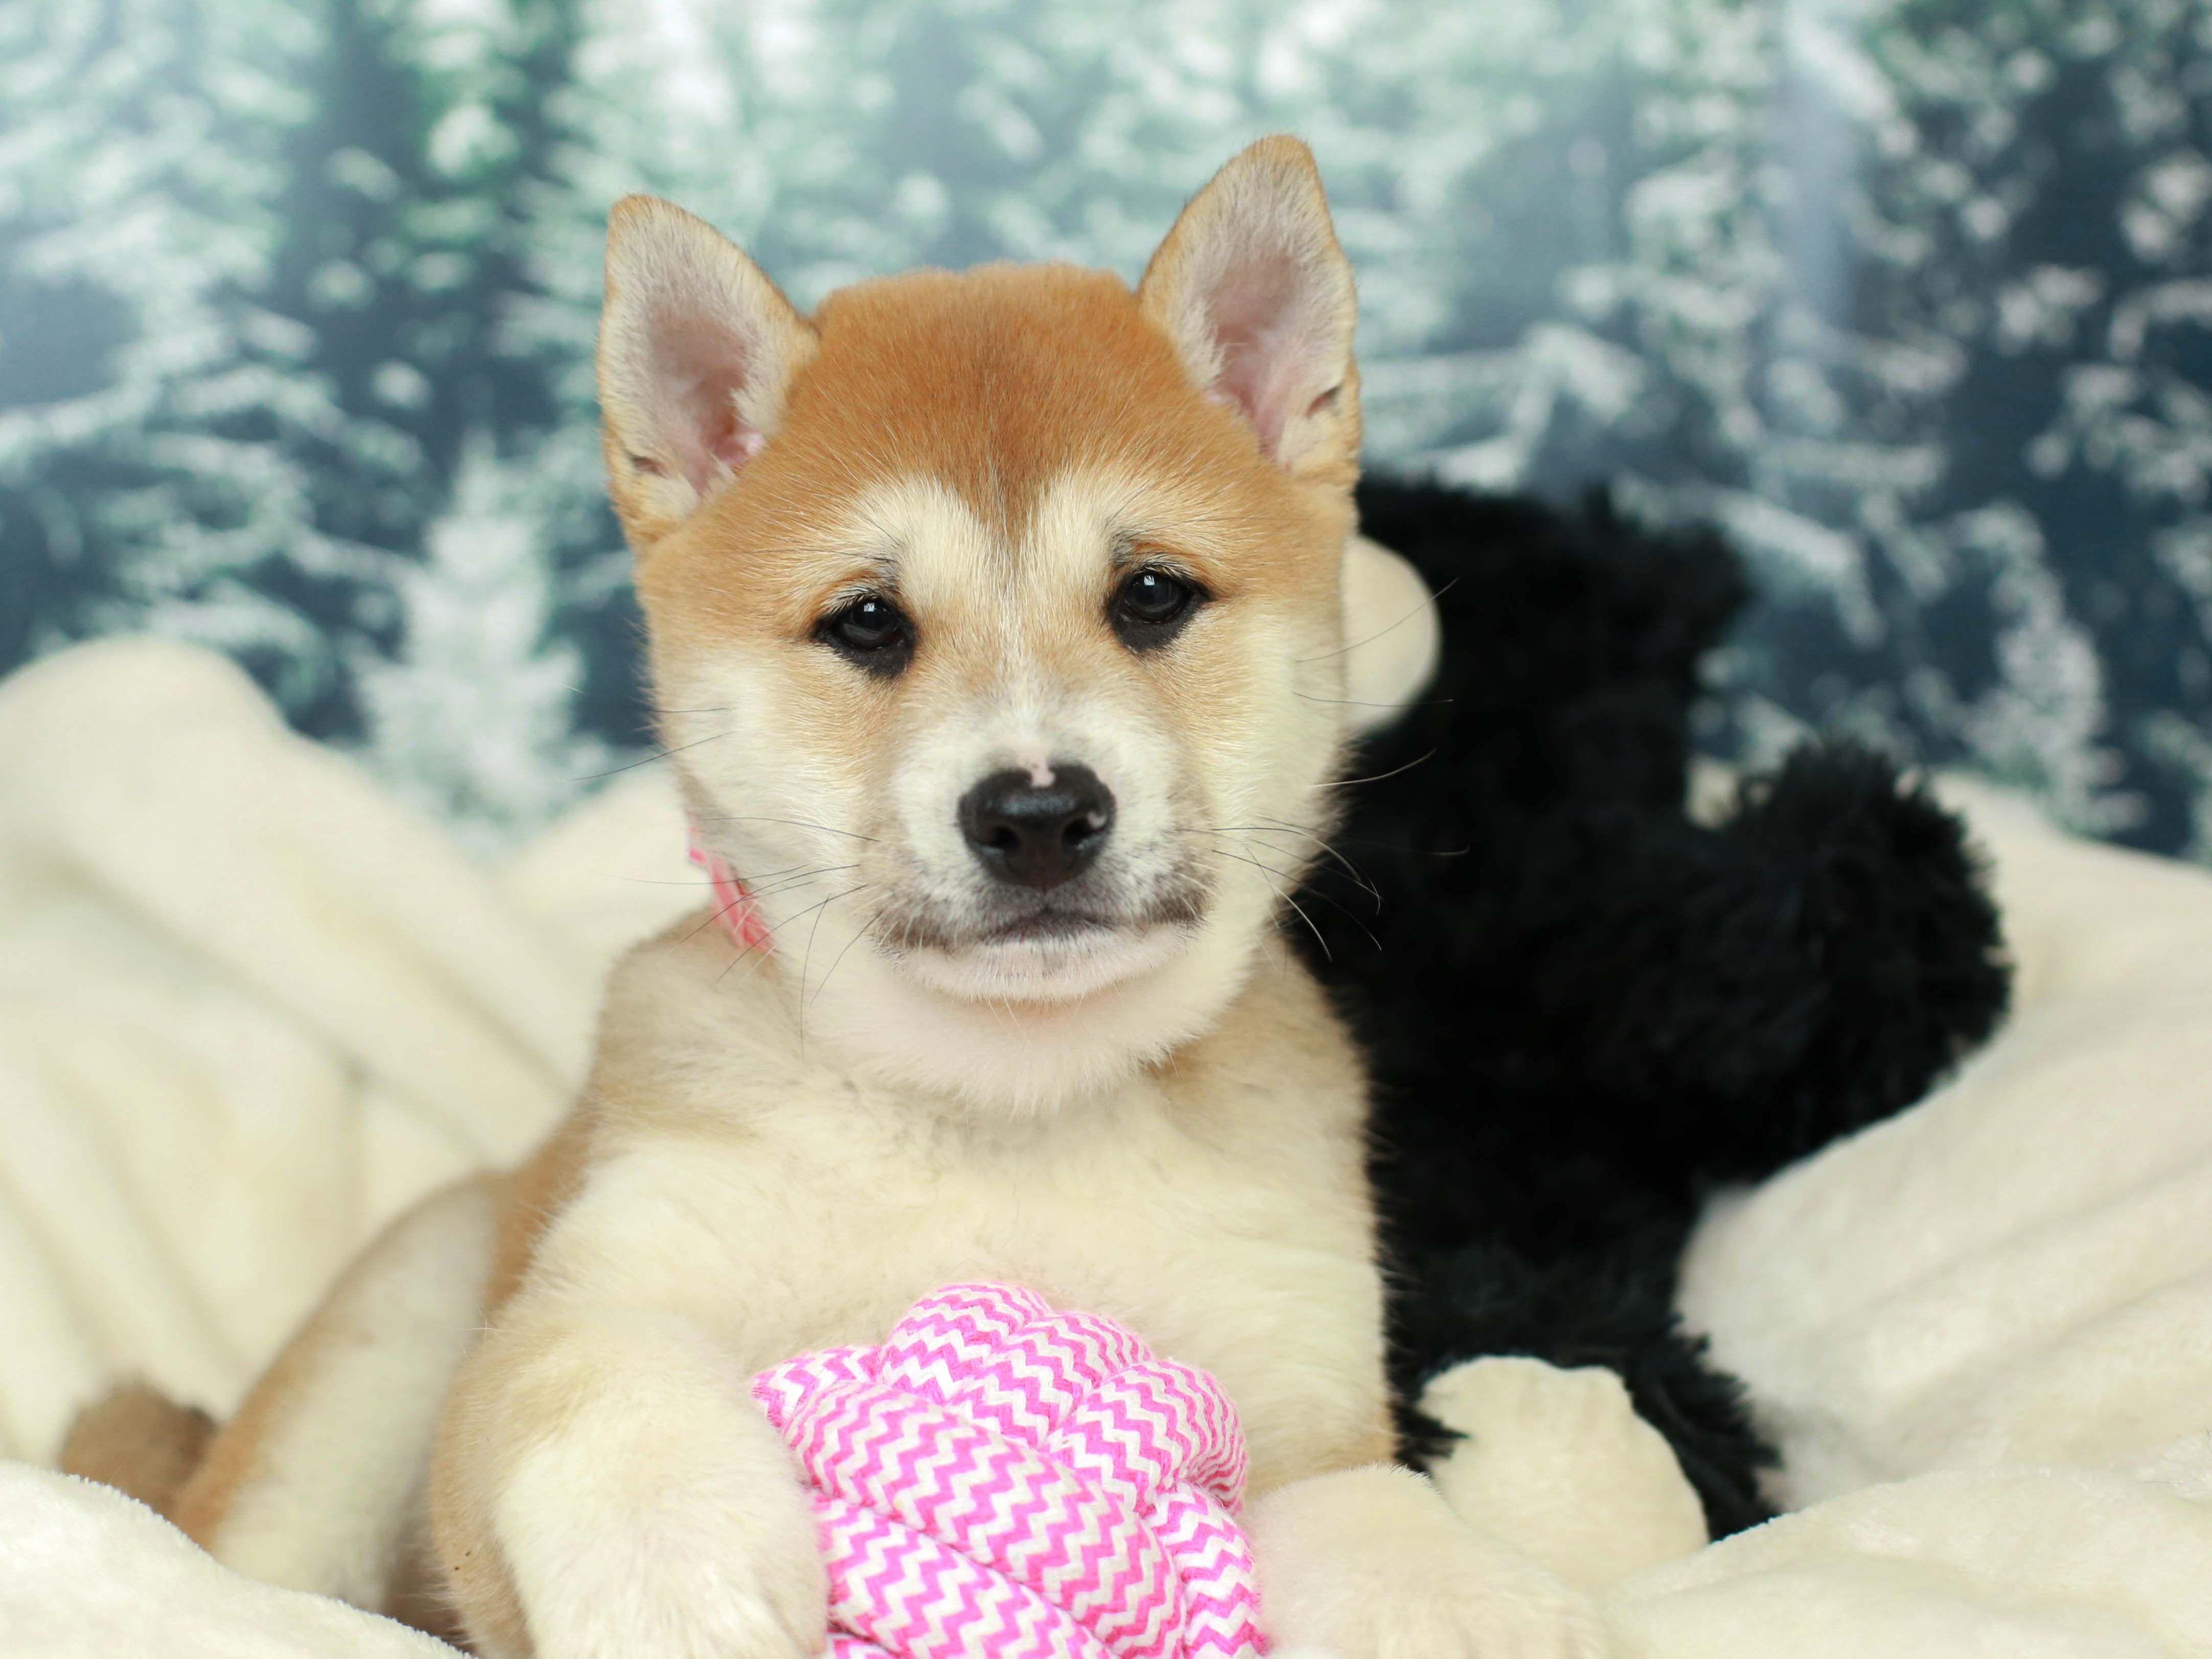 Shiba Inu Puppy Shiba Inu Puppy Puppies For Sale Puppy Store